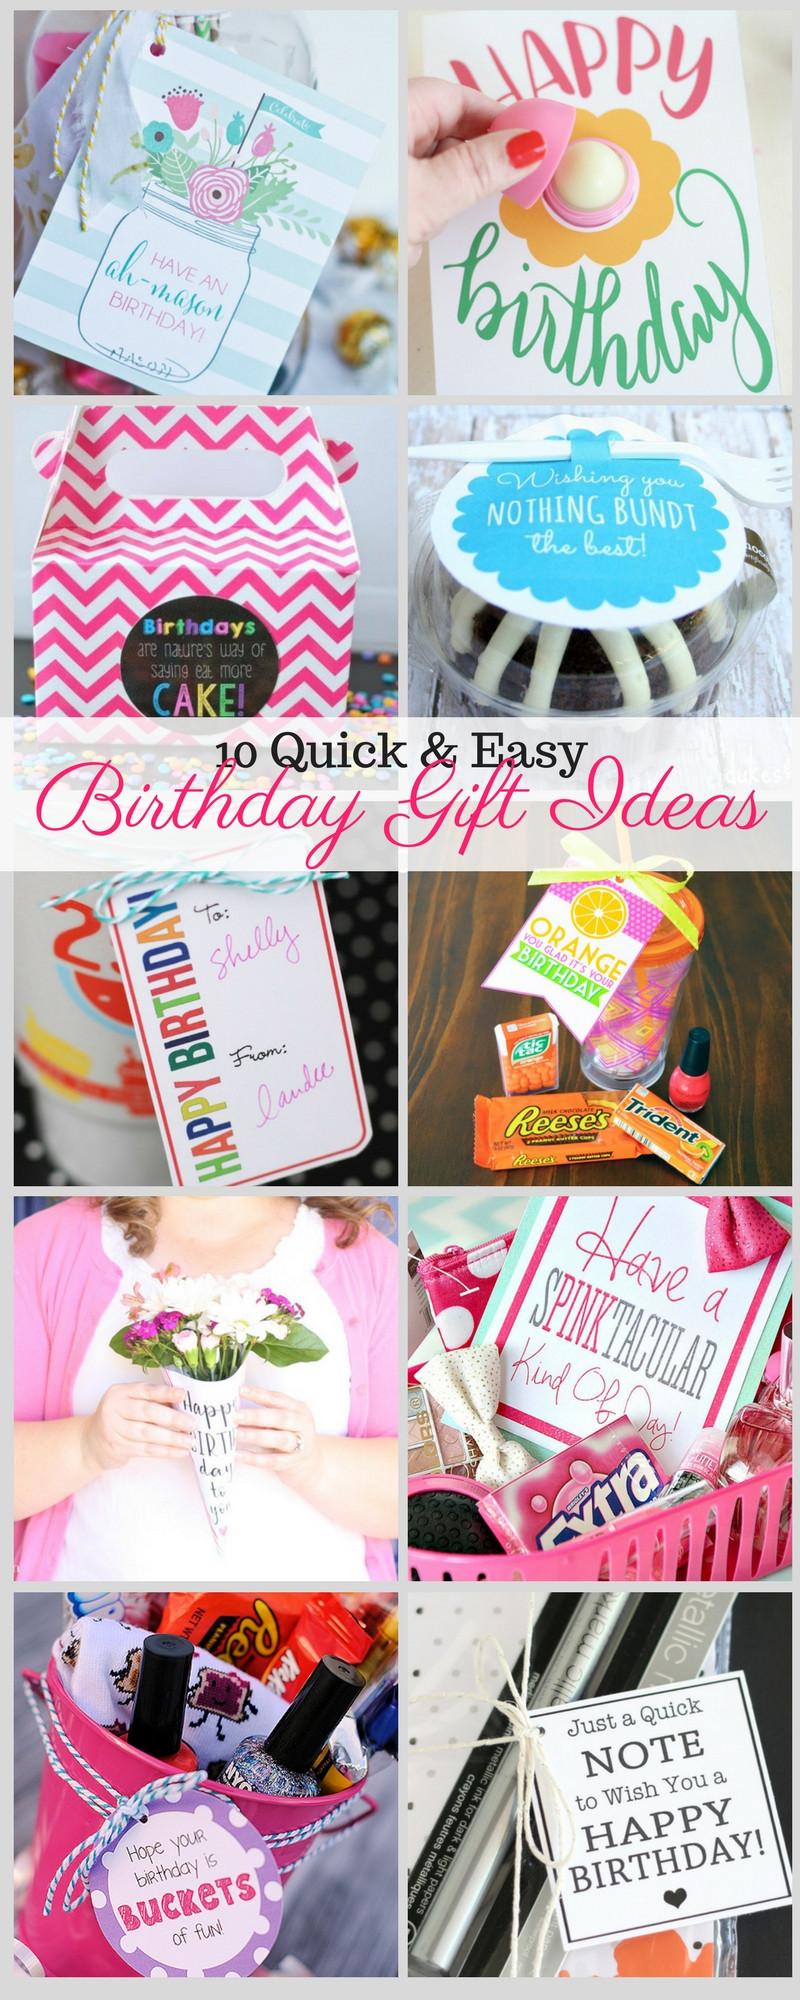 Easy Birthday Gift Ideas  10 Quick and Easy Birthday Gift Ideas — Liz on Call